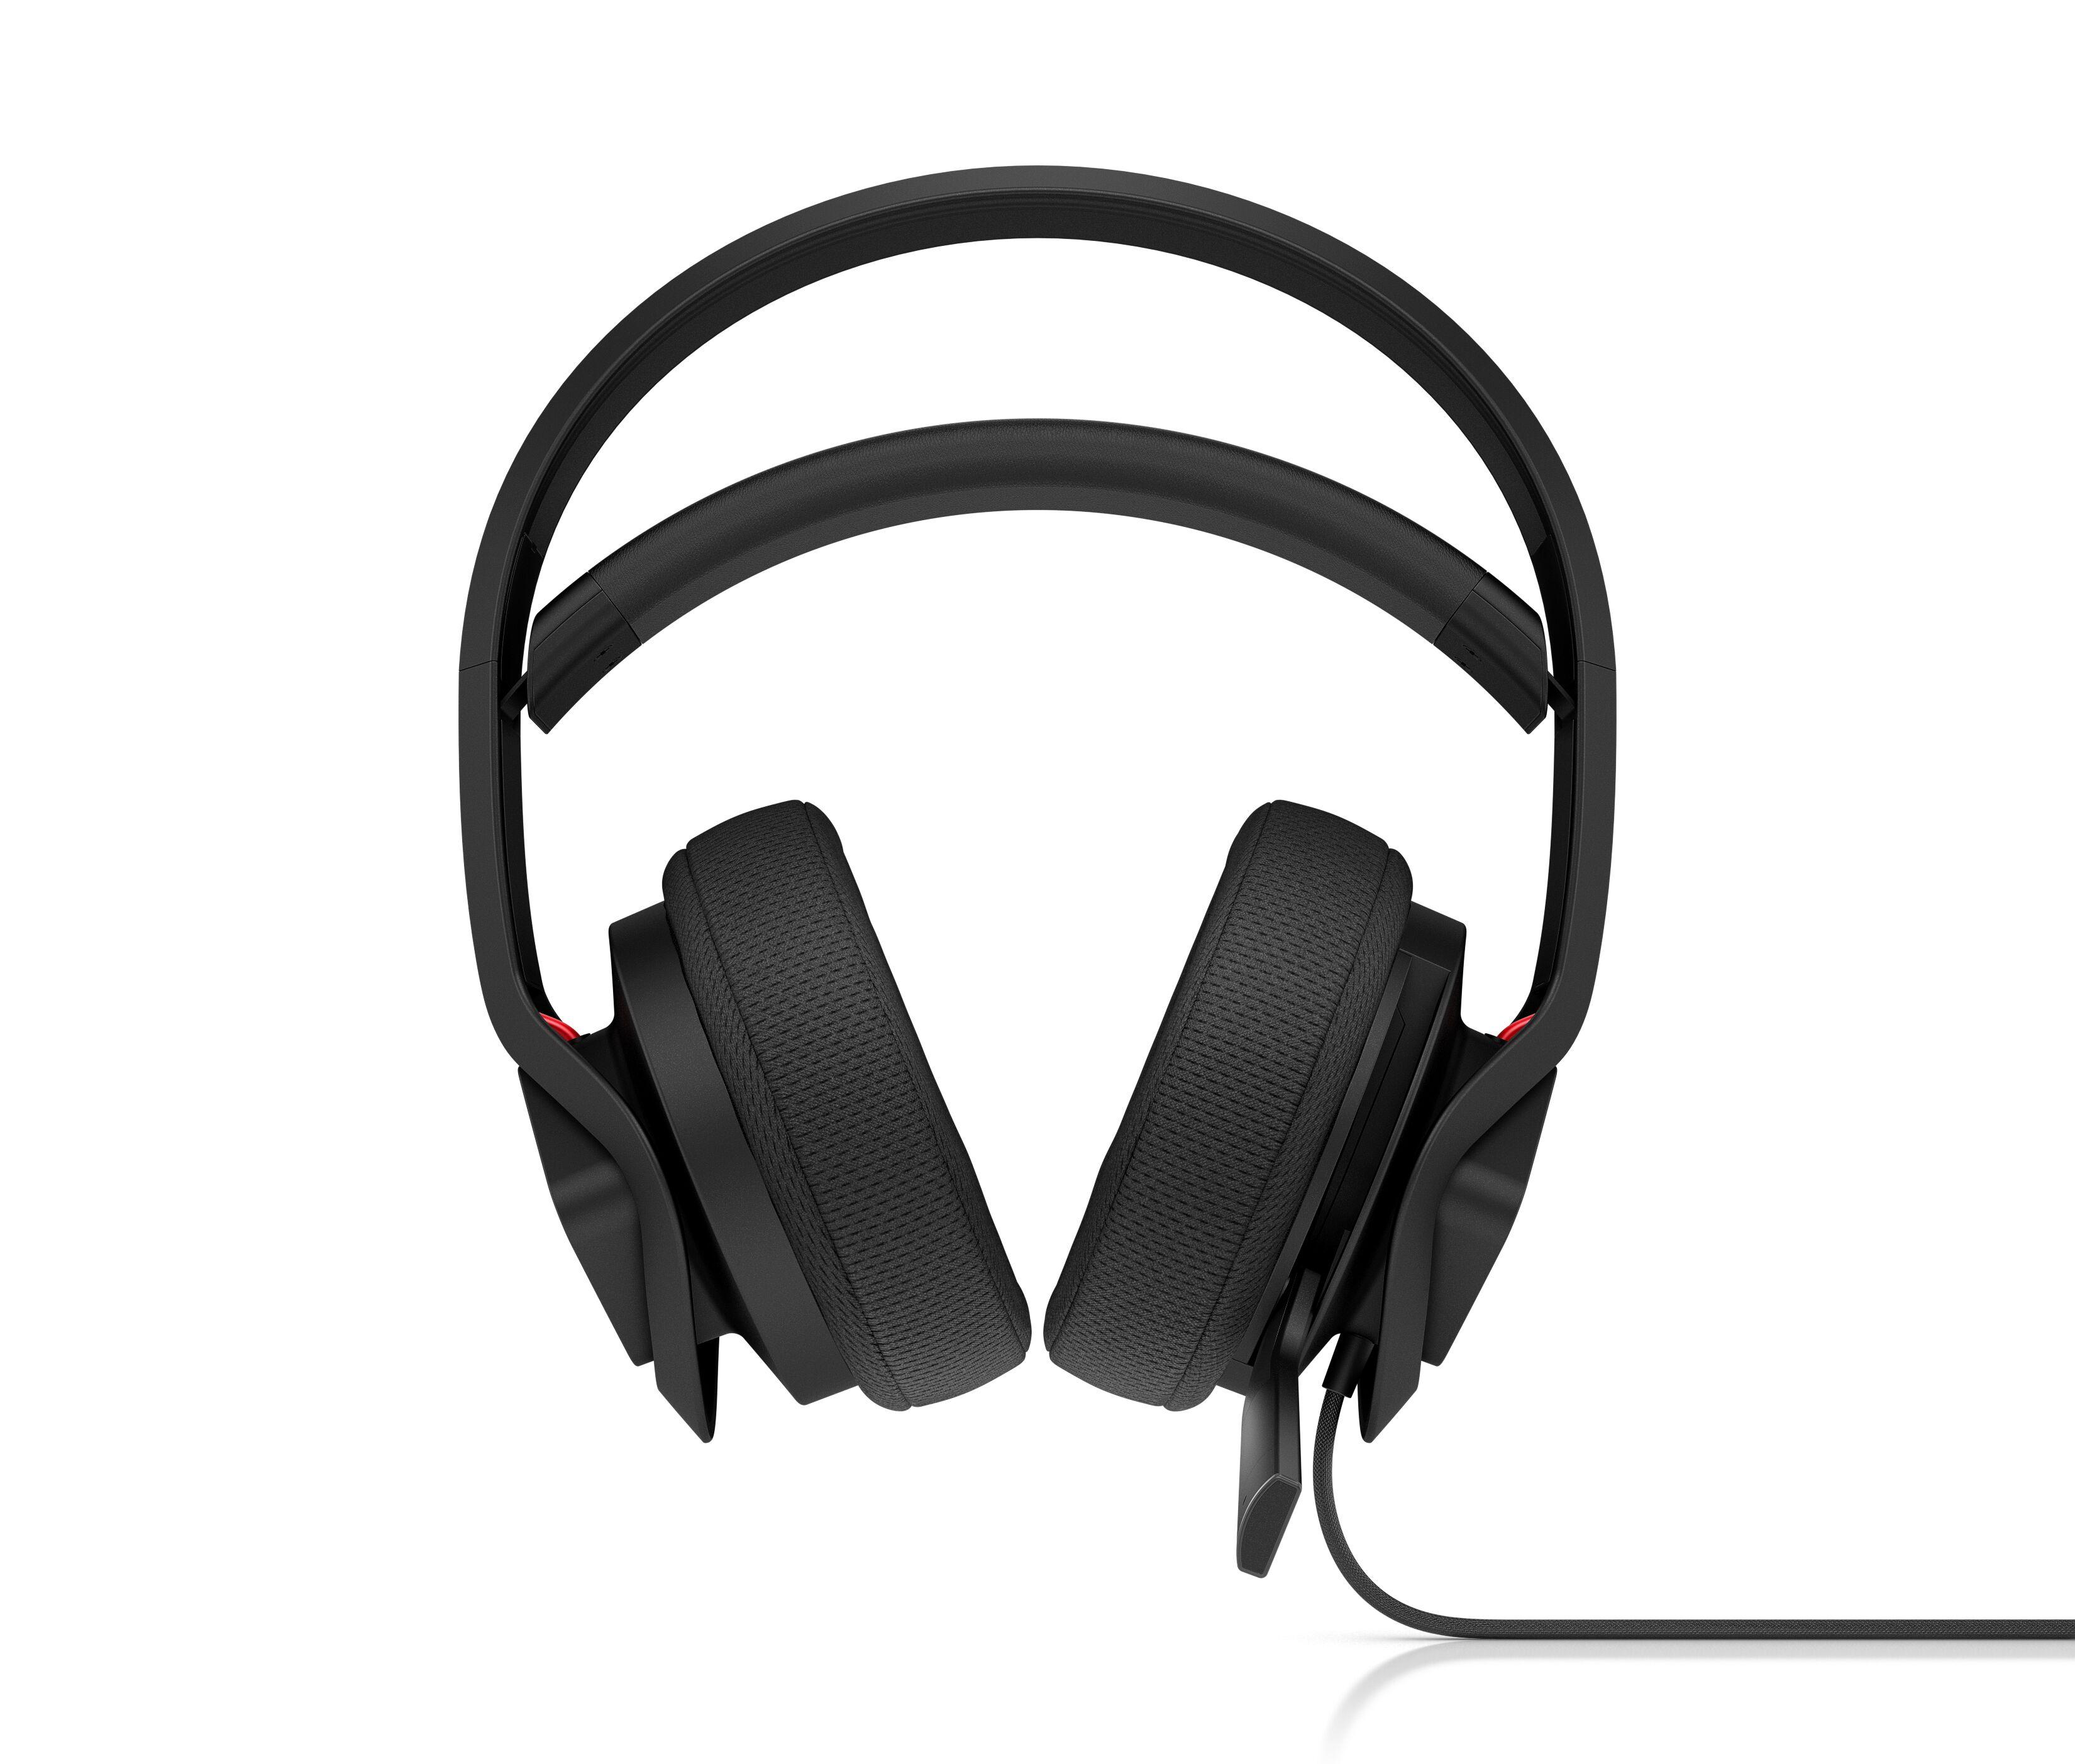 Gamescom 2019 - Mindframe Prime Headset 6 - Hynerd.it